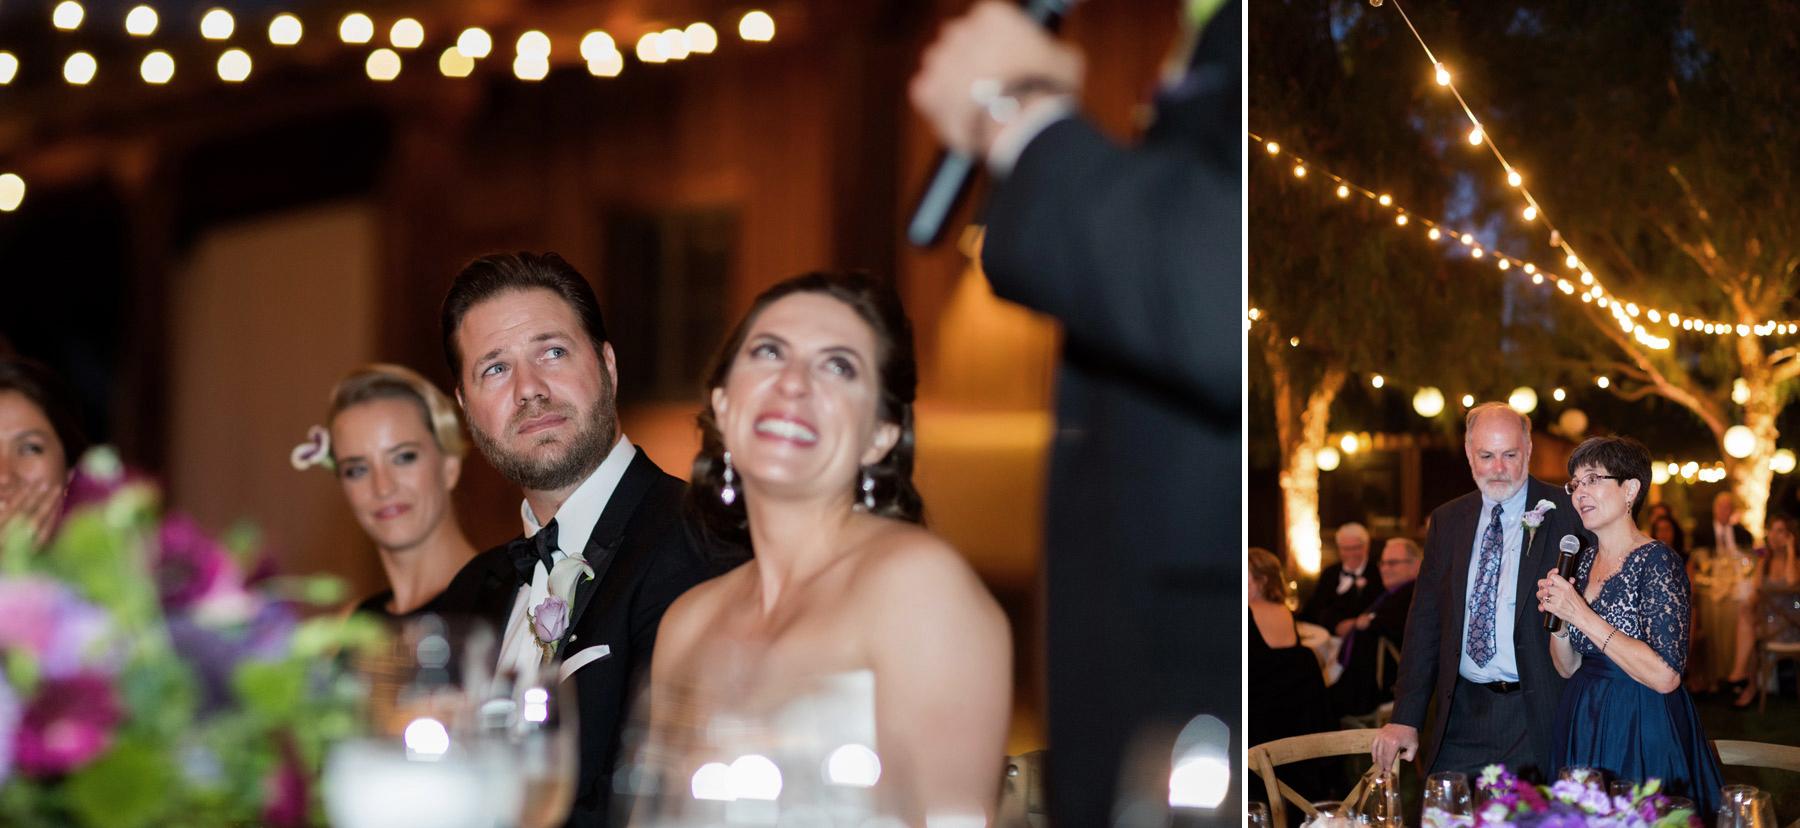 roblar winery wedding speeches